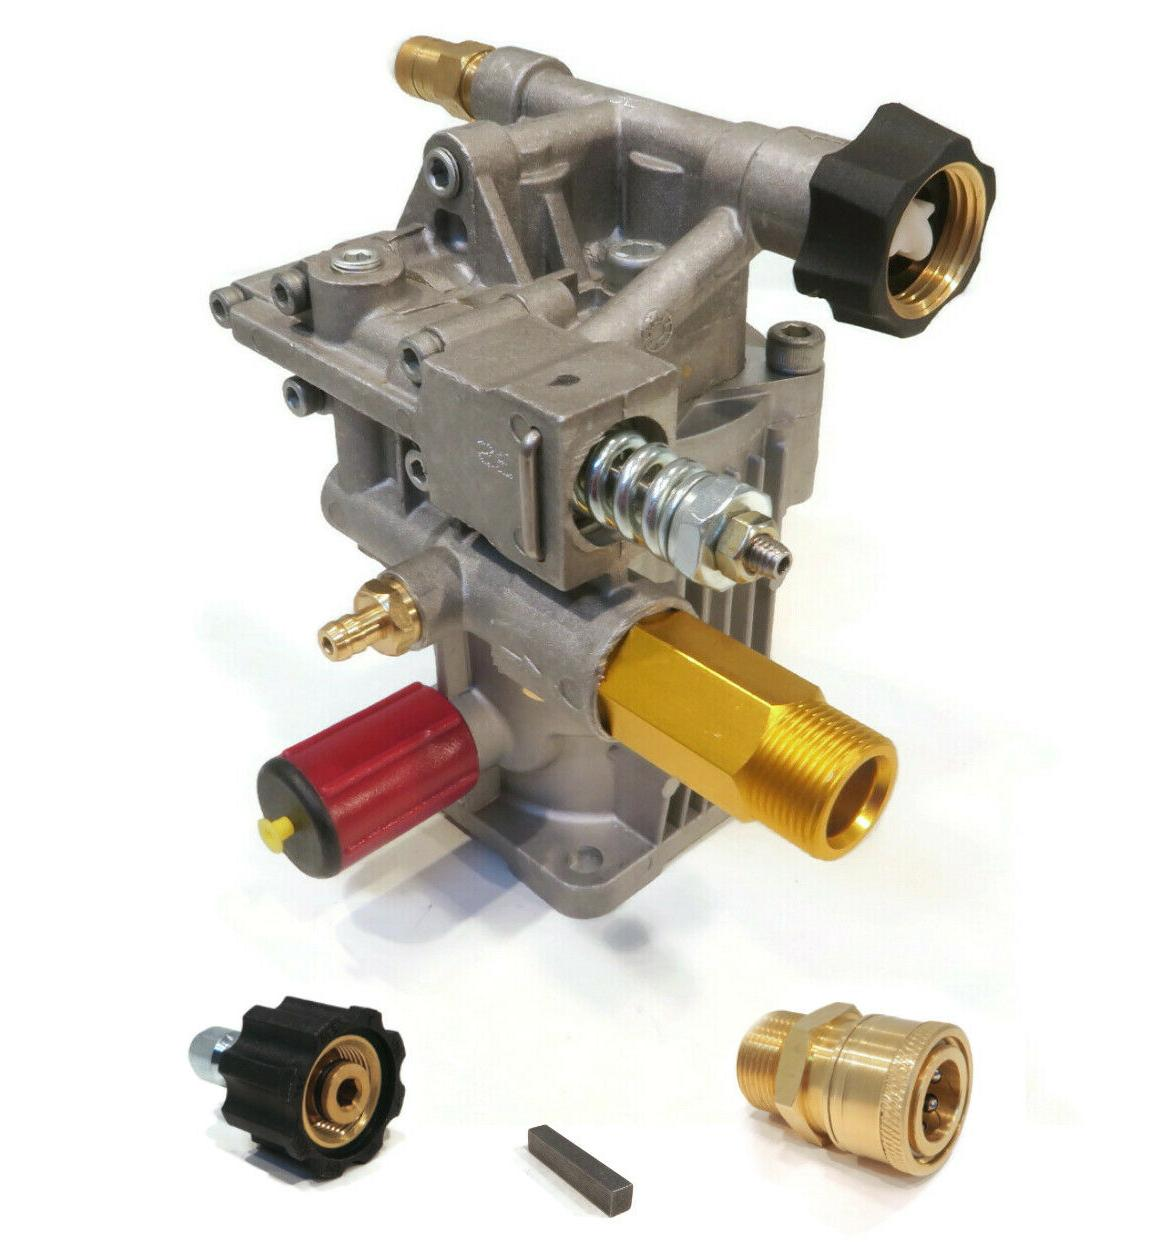 pressure washer pump kit fits power washers